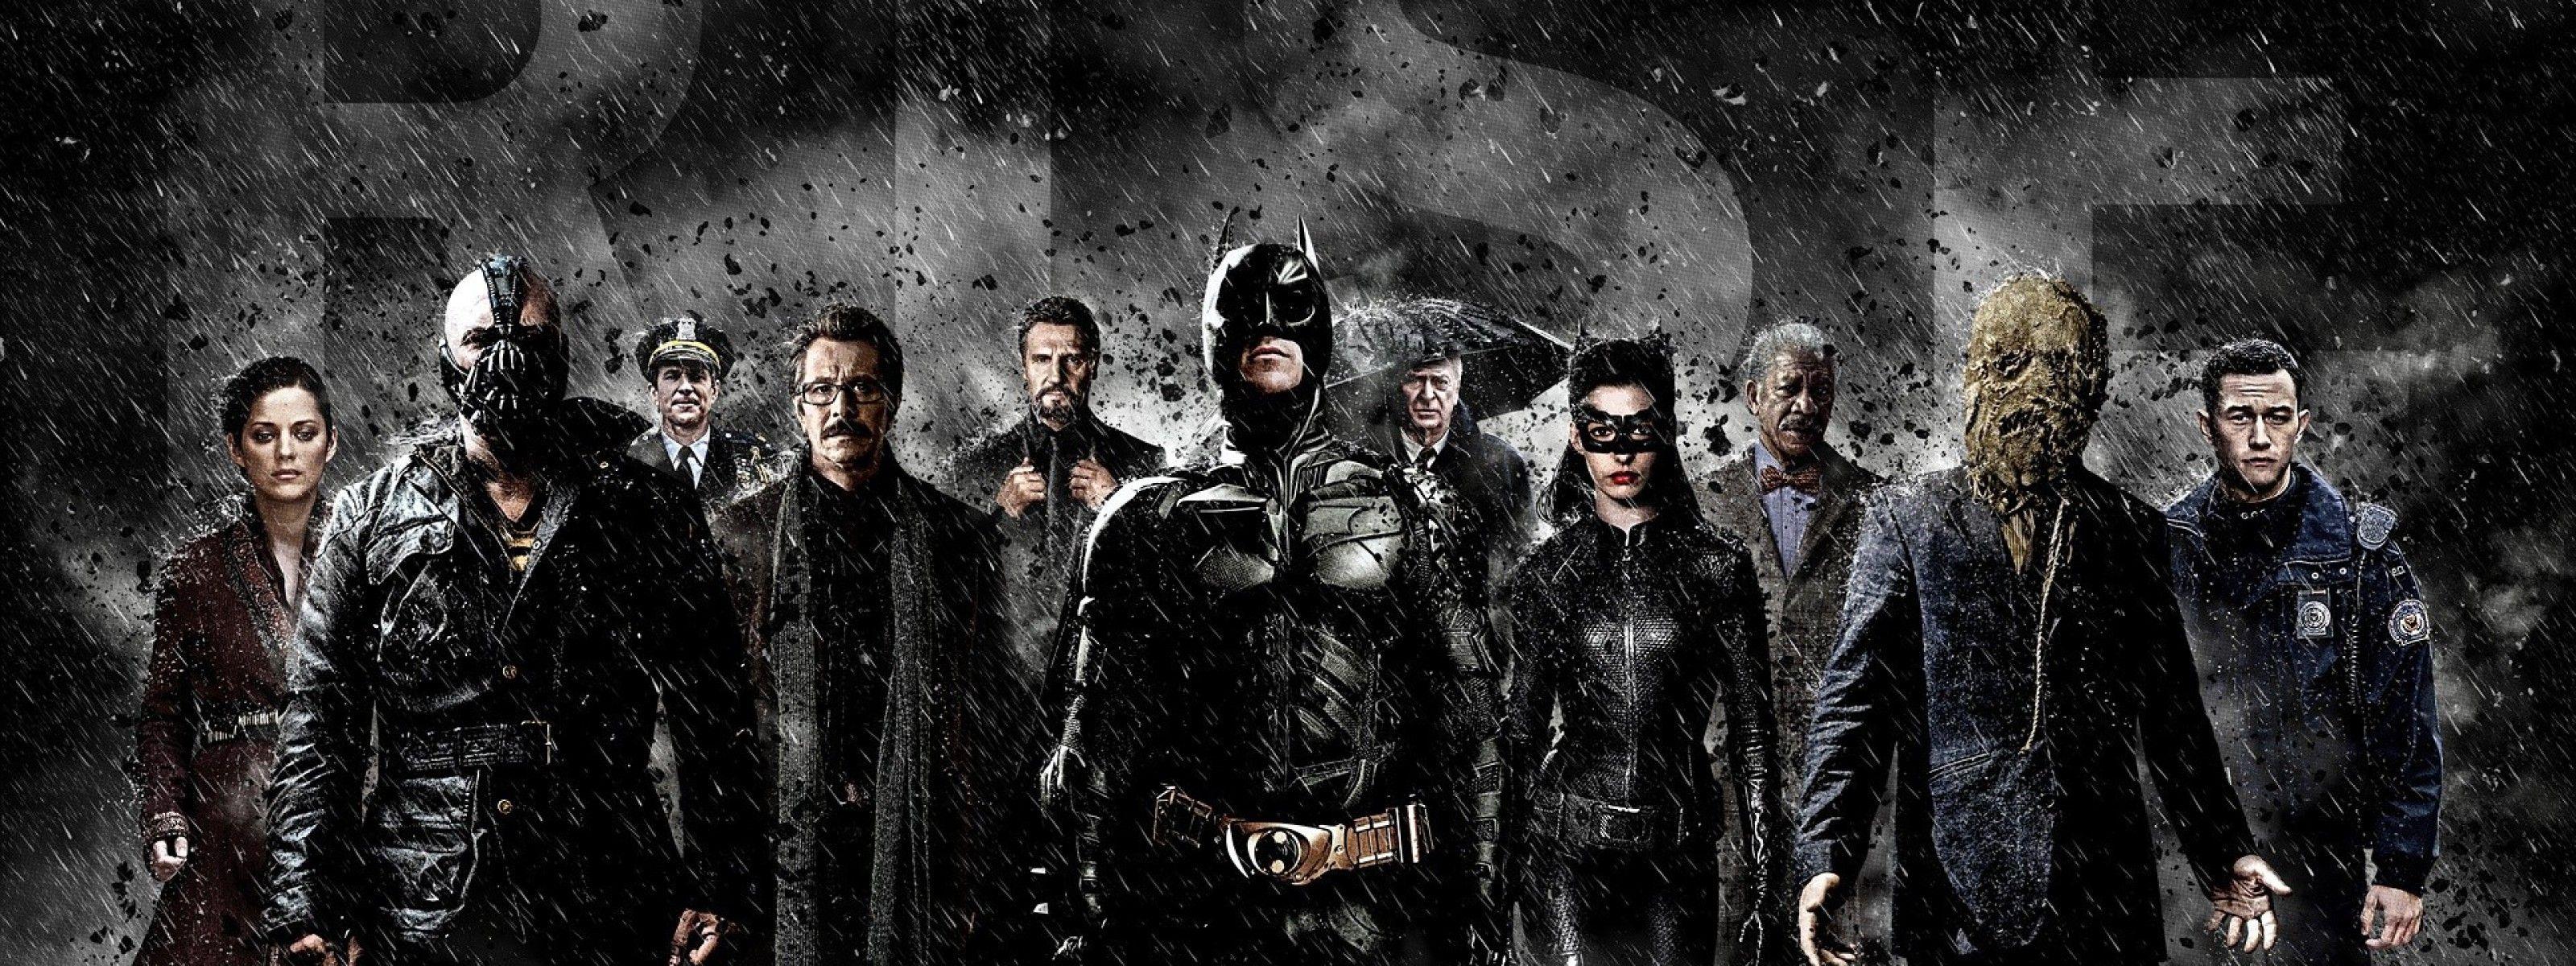 http://topwalls.net/wallpapers/2012/09/dark-knight-rises-batman-1200x3200.jpg